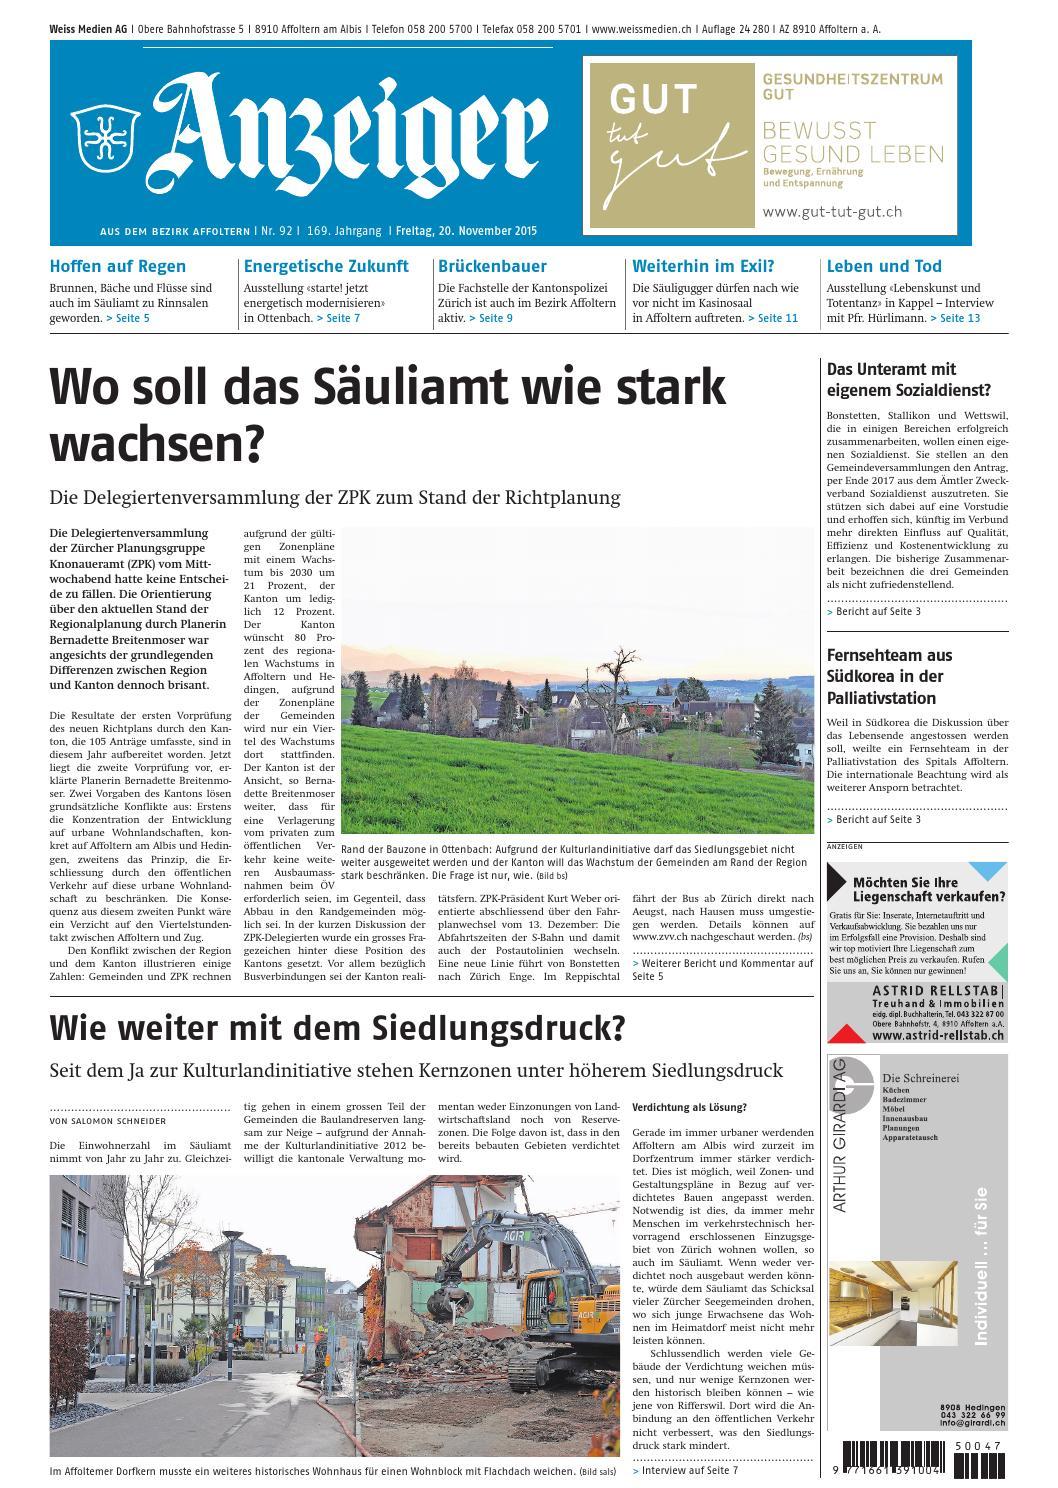 092 2015 by AZ-Anzeiger - issuu